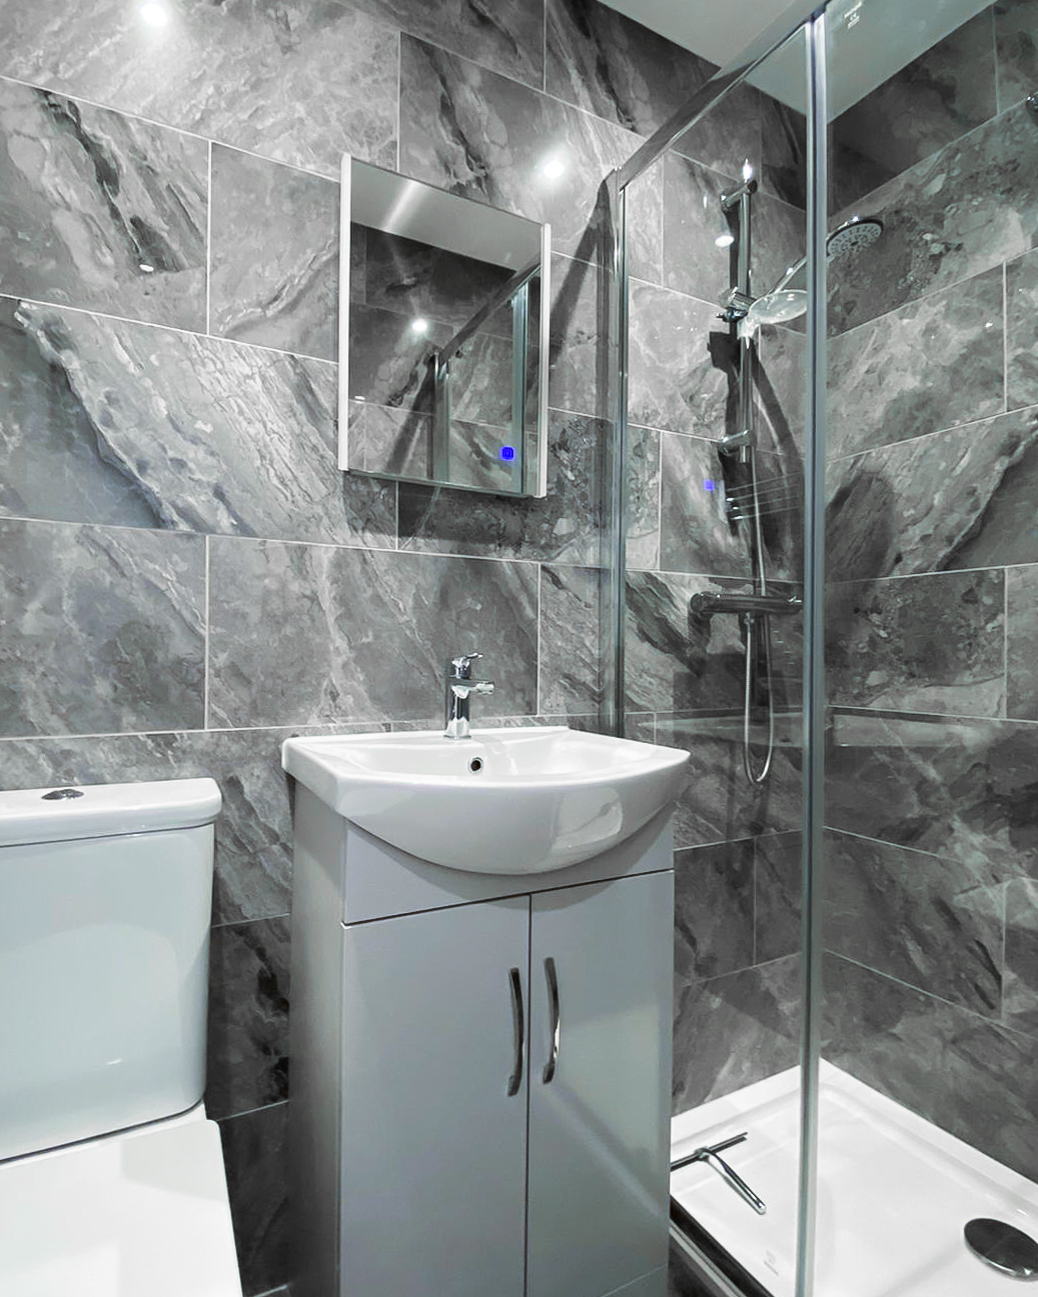 Russell Hewes bathroom renovation mitcham london